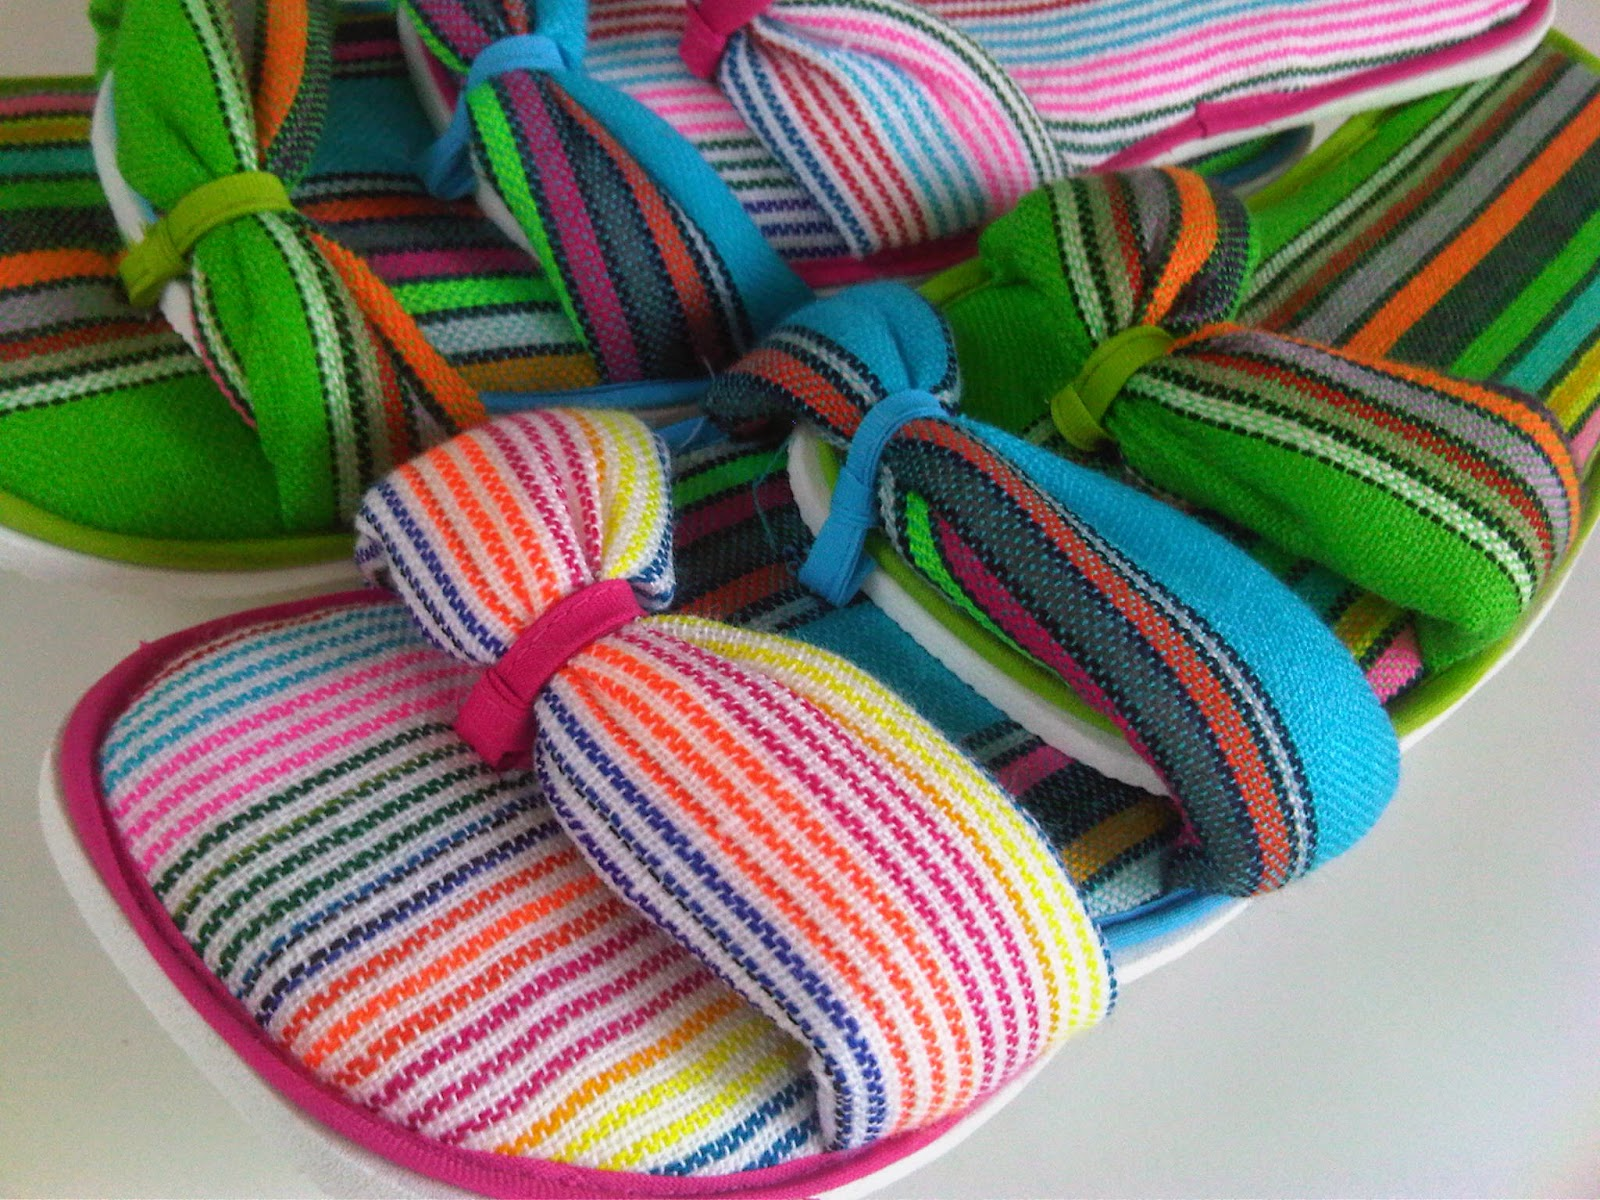 pantuflas mexicanas